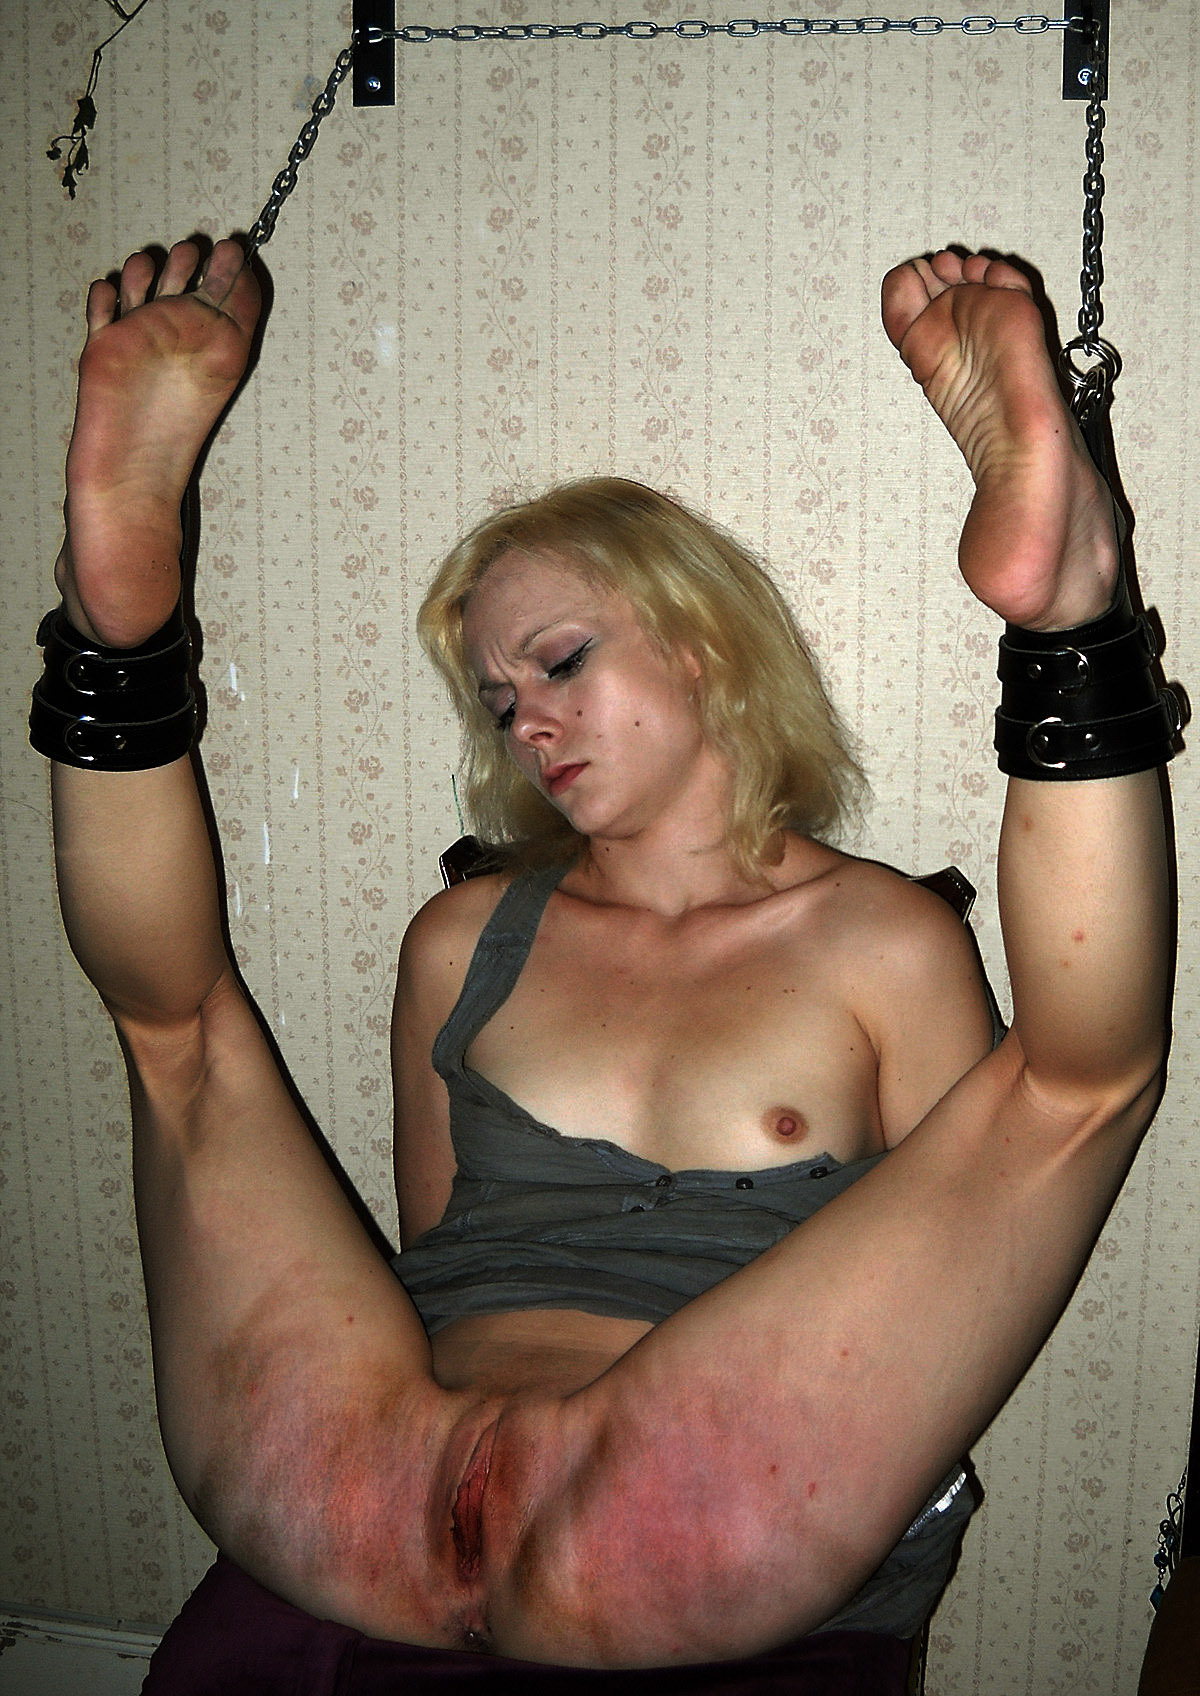 submissive little fucker